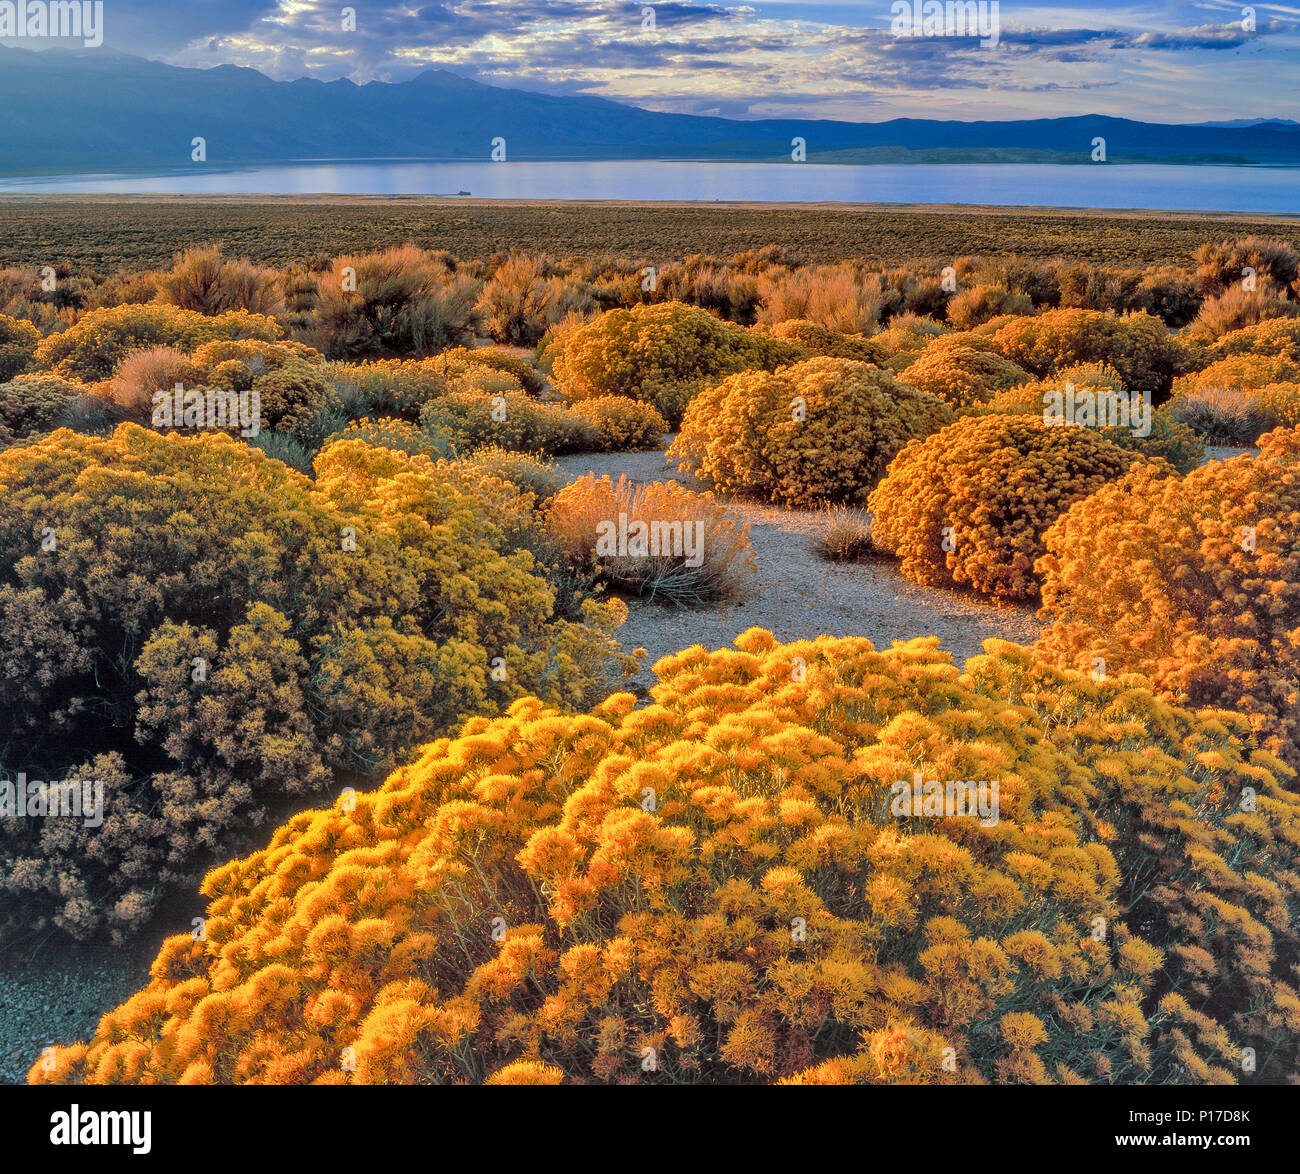 Letztes Licht, Rabbitbrush, Ericameria nauseosa, Mono Lake, Mono Basin National Forest Scenic Area, Inyo National Forest, Kalifornien Stockbild